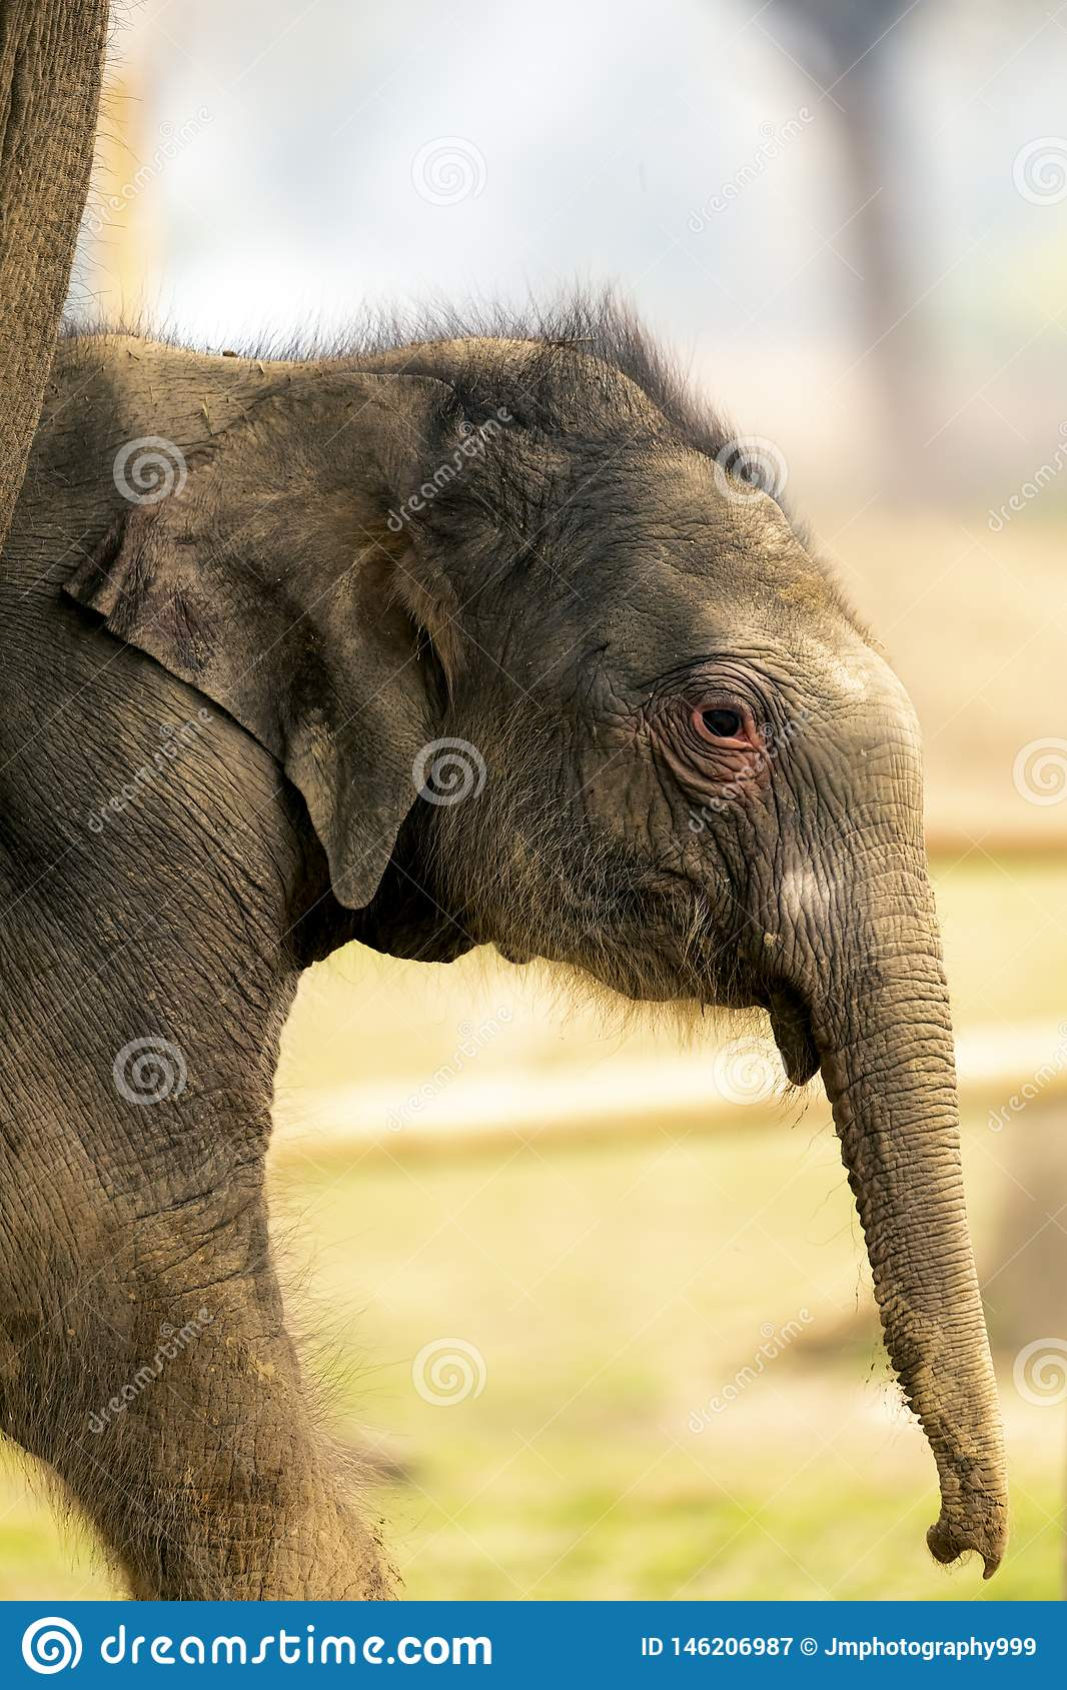 Cute Baby Elephant in chitwan National park